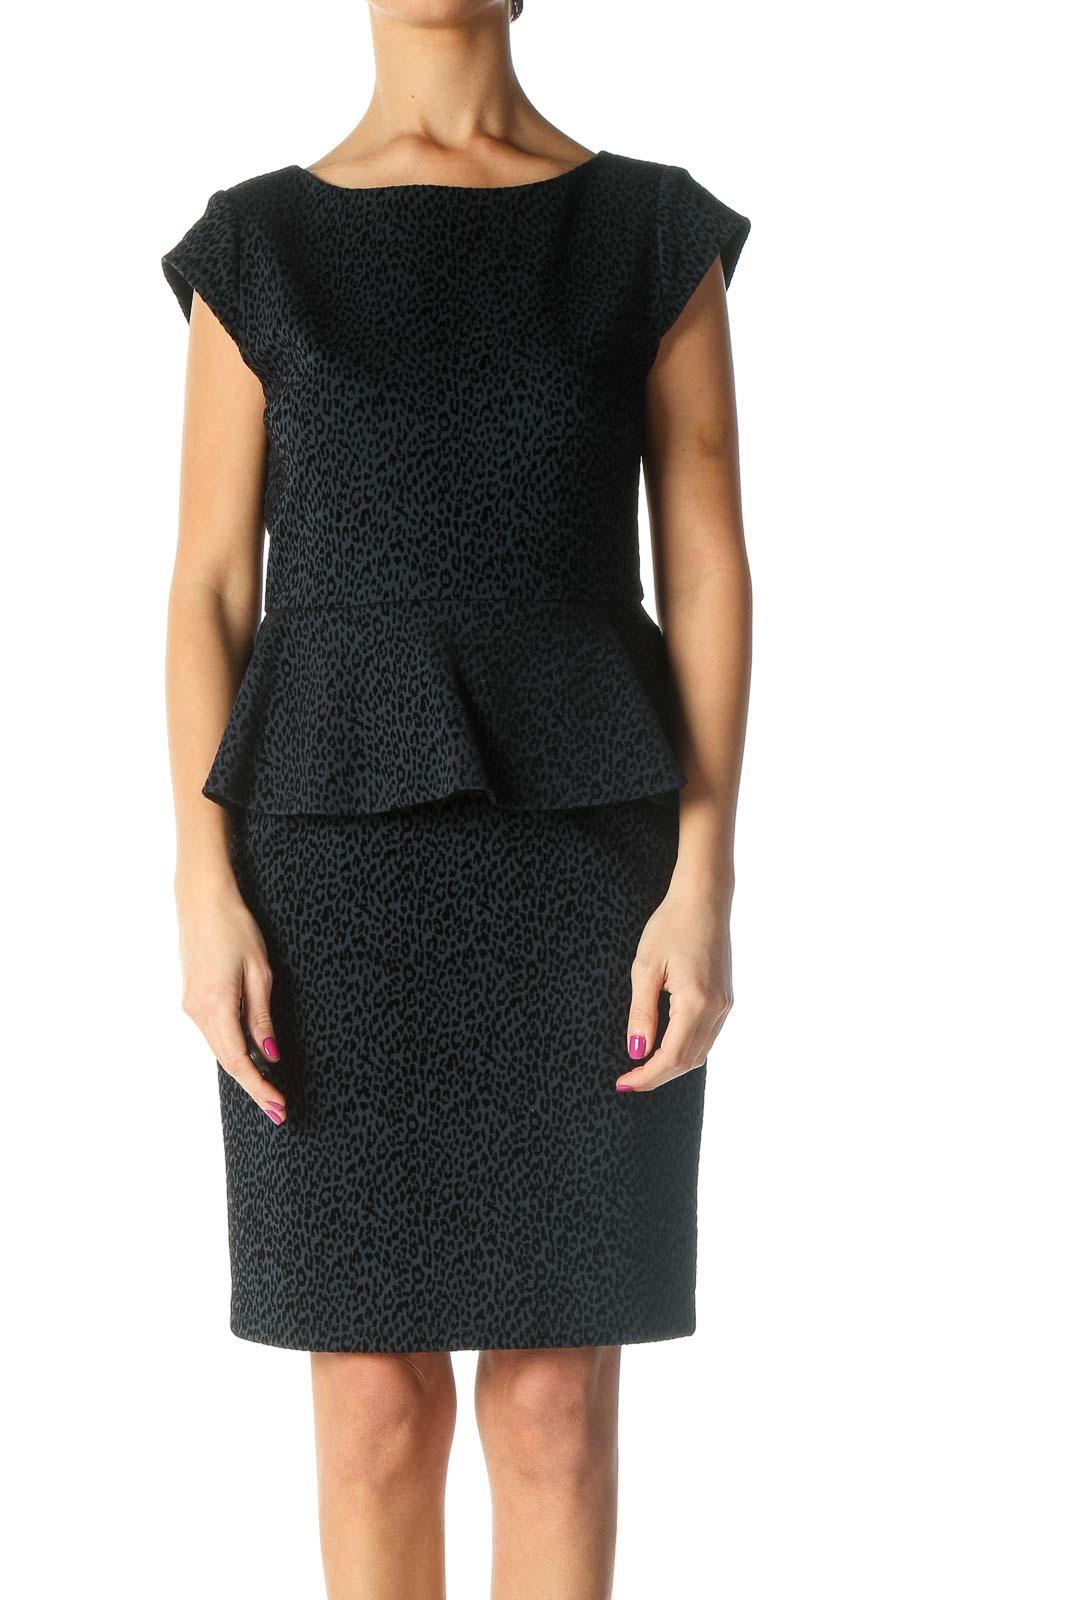 Black Textured Dress Front